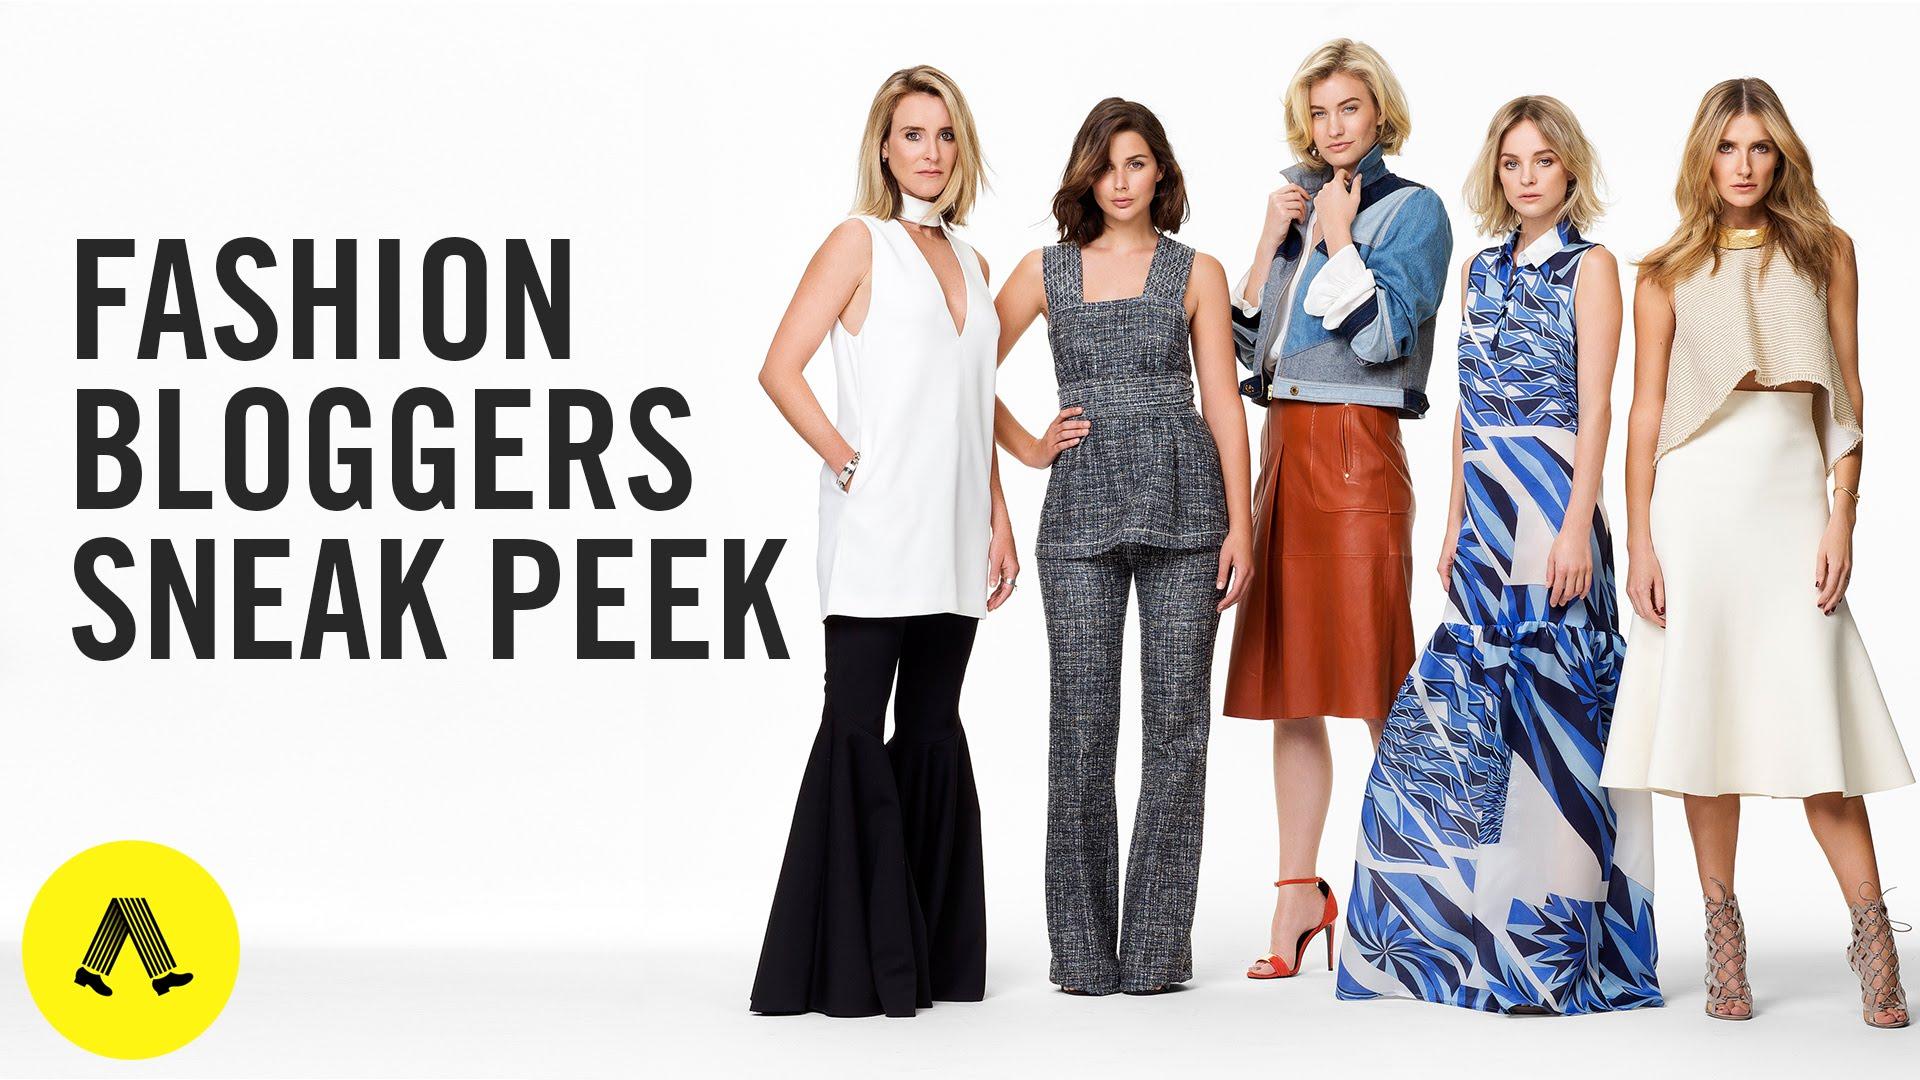 Fashion Bloggers: Season 2